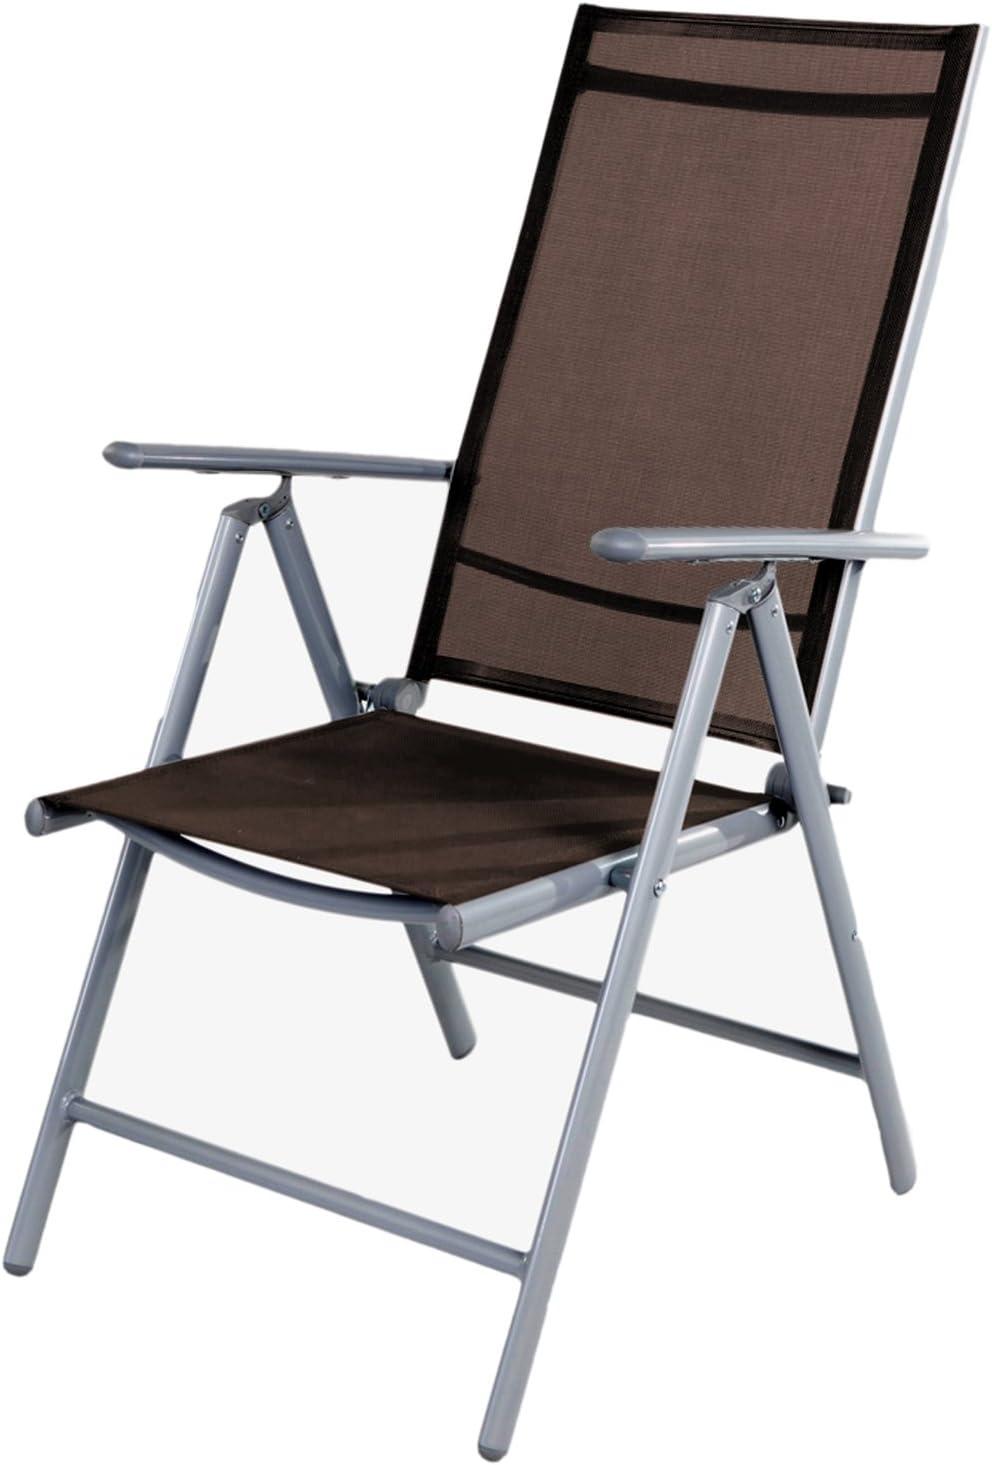 Mojawo Garden Chair with High-Backed Recliner 10 Positions Adjustable  Foldable Folding Chair Weatherproof Aluminium Weatherproof Garden Furniture